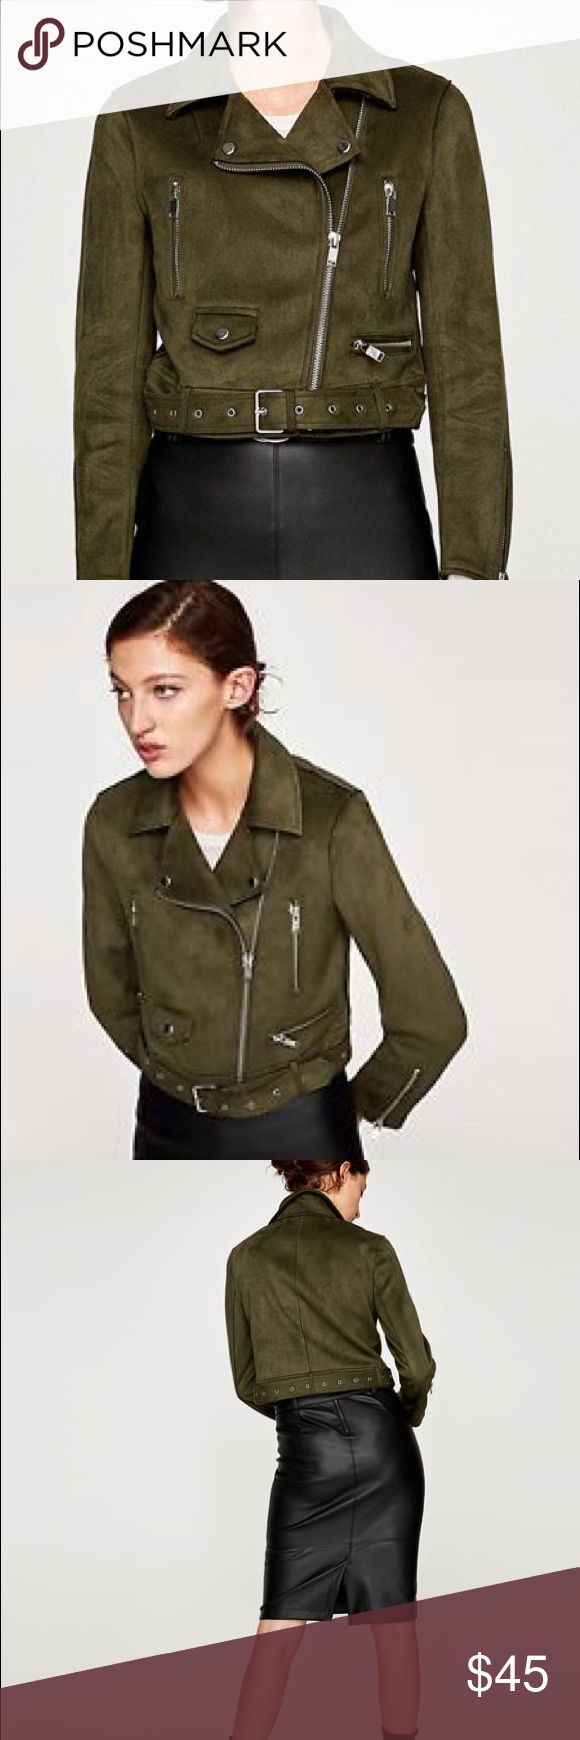 Faux Suede Biker Jacket Beautiful faux suede jacket from Zara. Never worn. New without tags. Zara Jackets & Coats